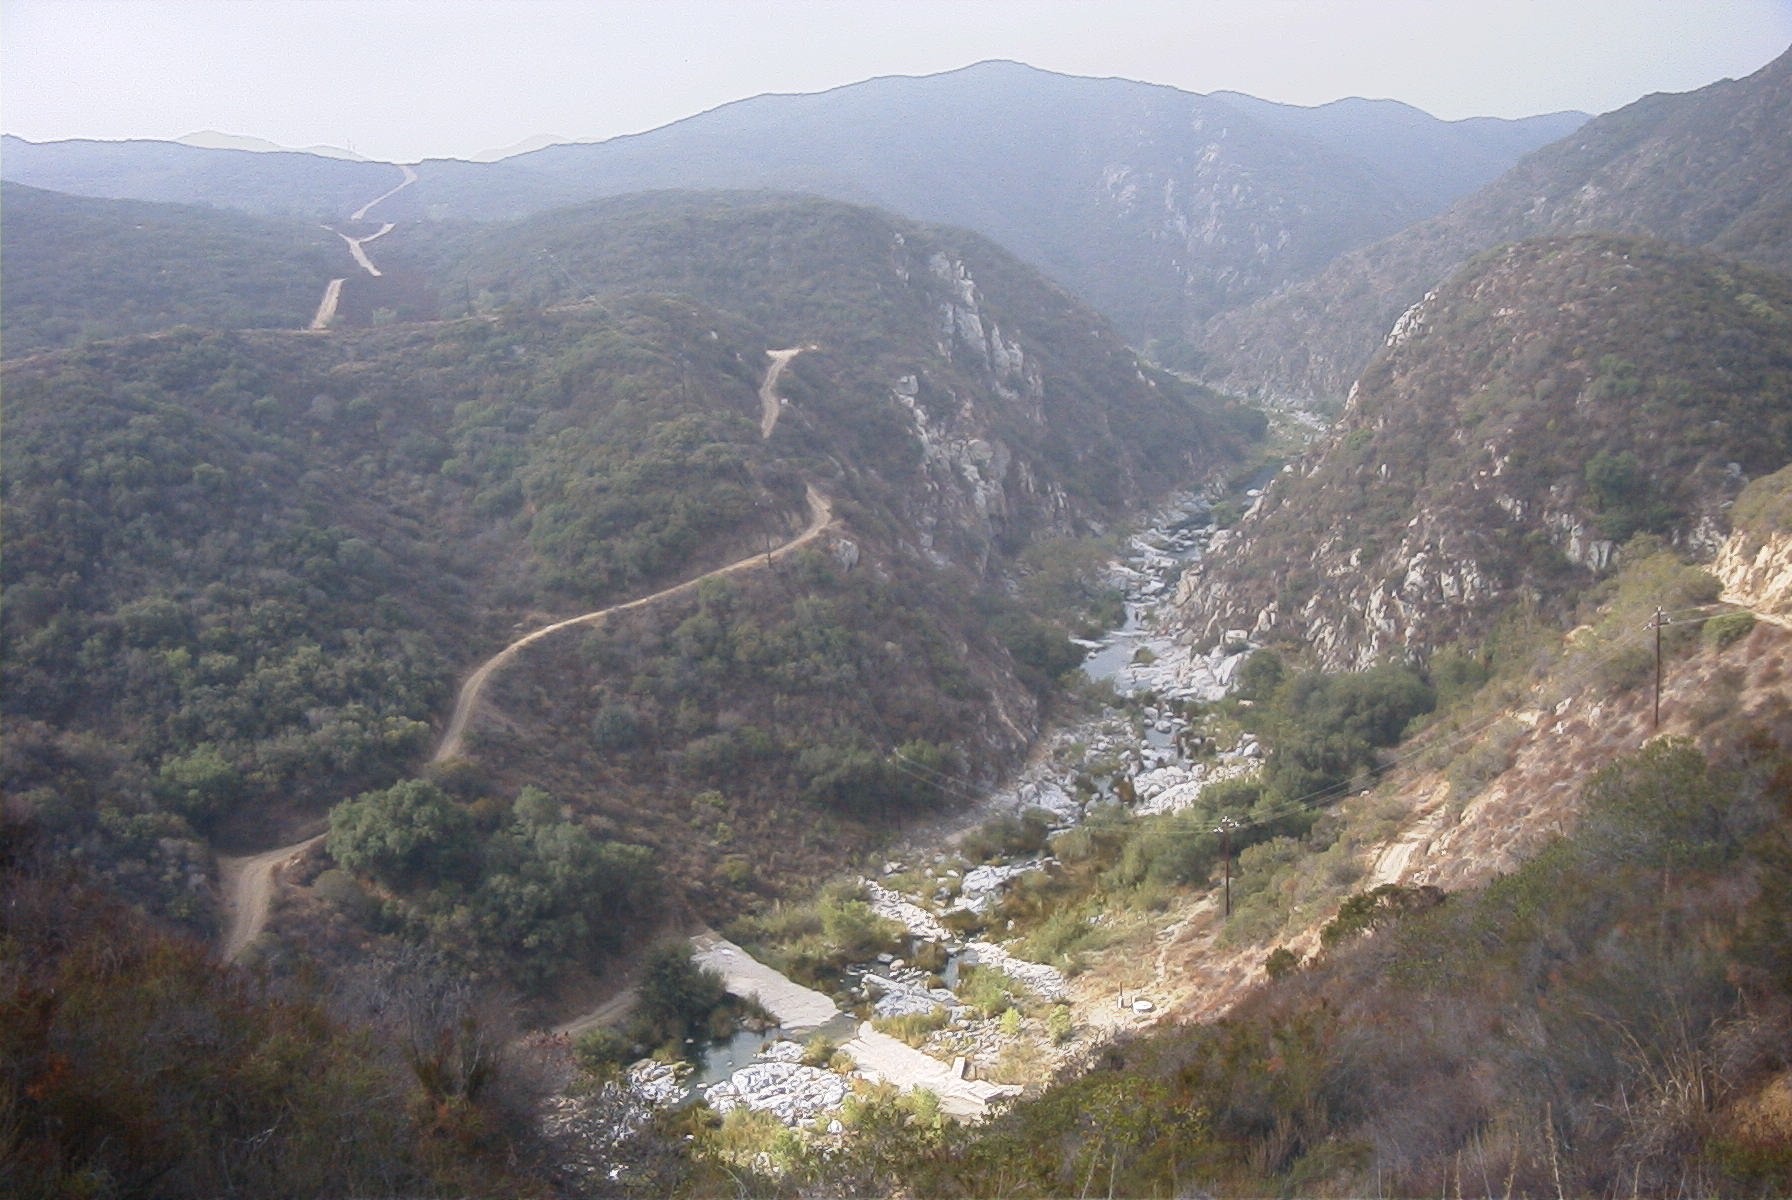 Santa Margarita Ecological Reserve